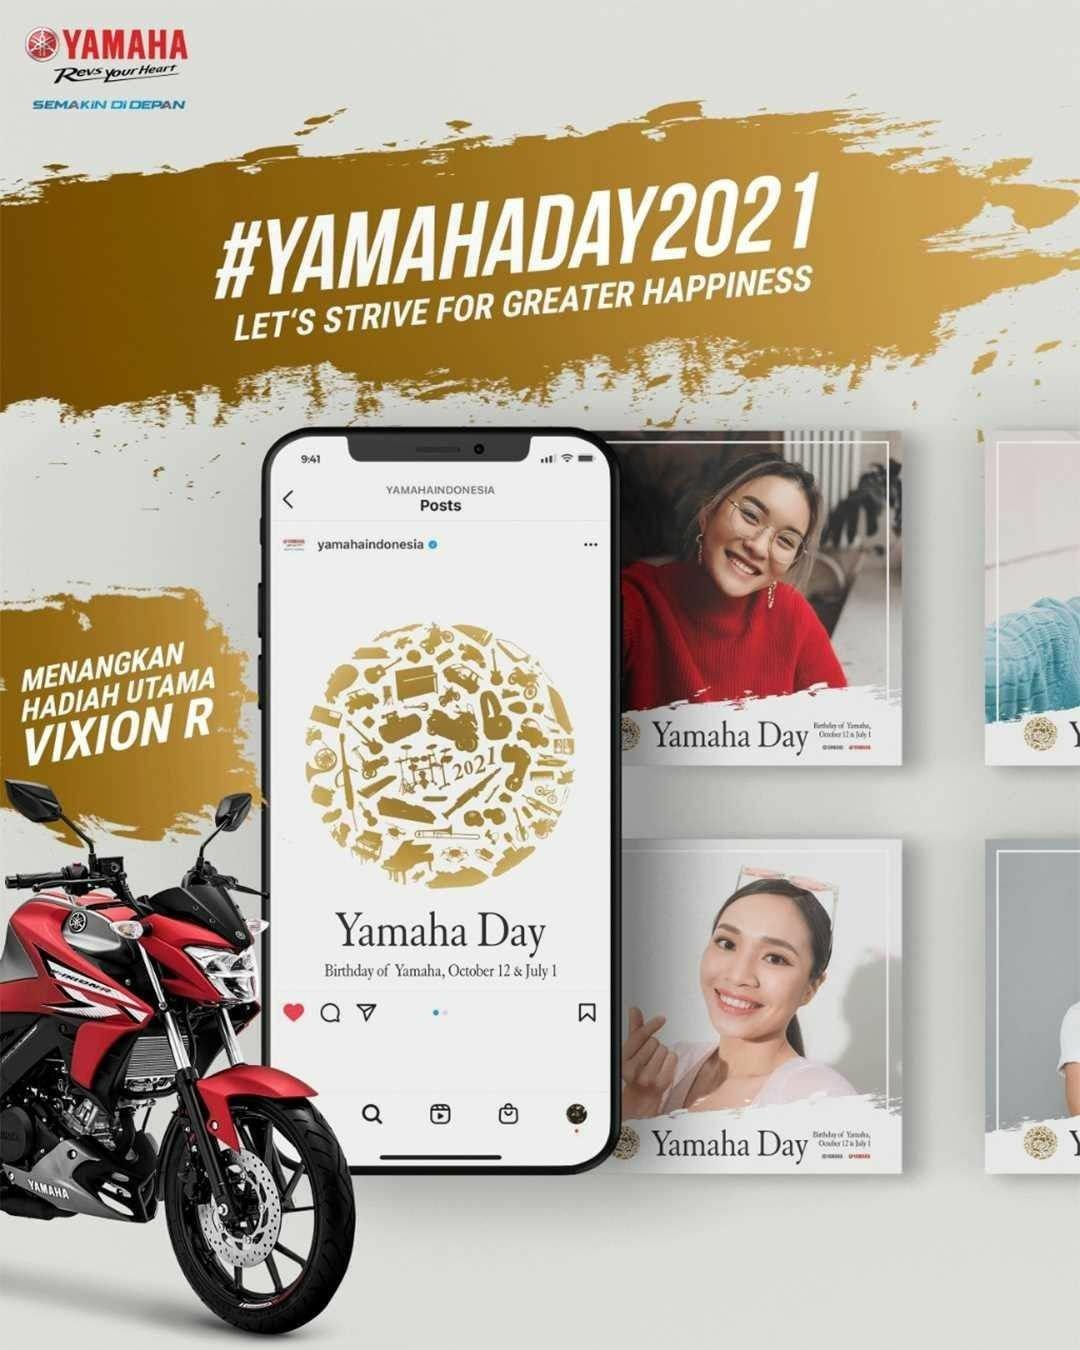 Anniversary Yamaha Motor Company Ke-66, Yamaha Jatim Adakan Photo Competition